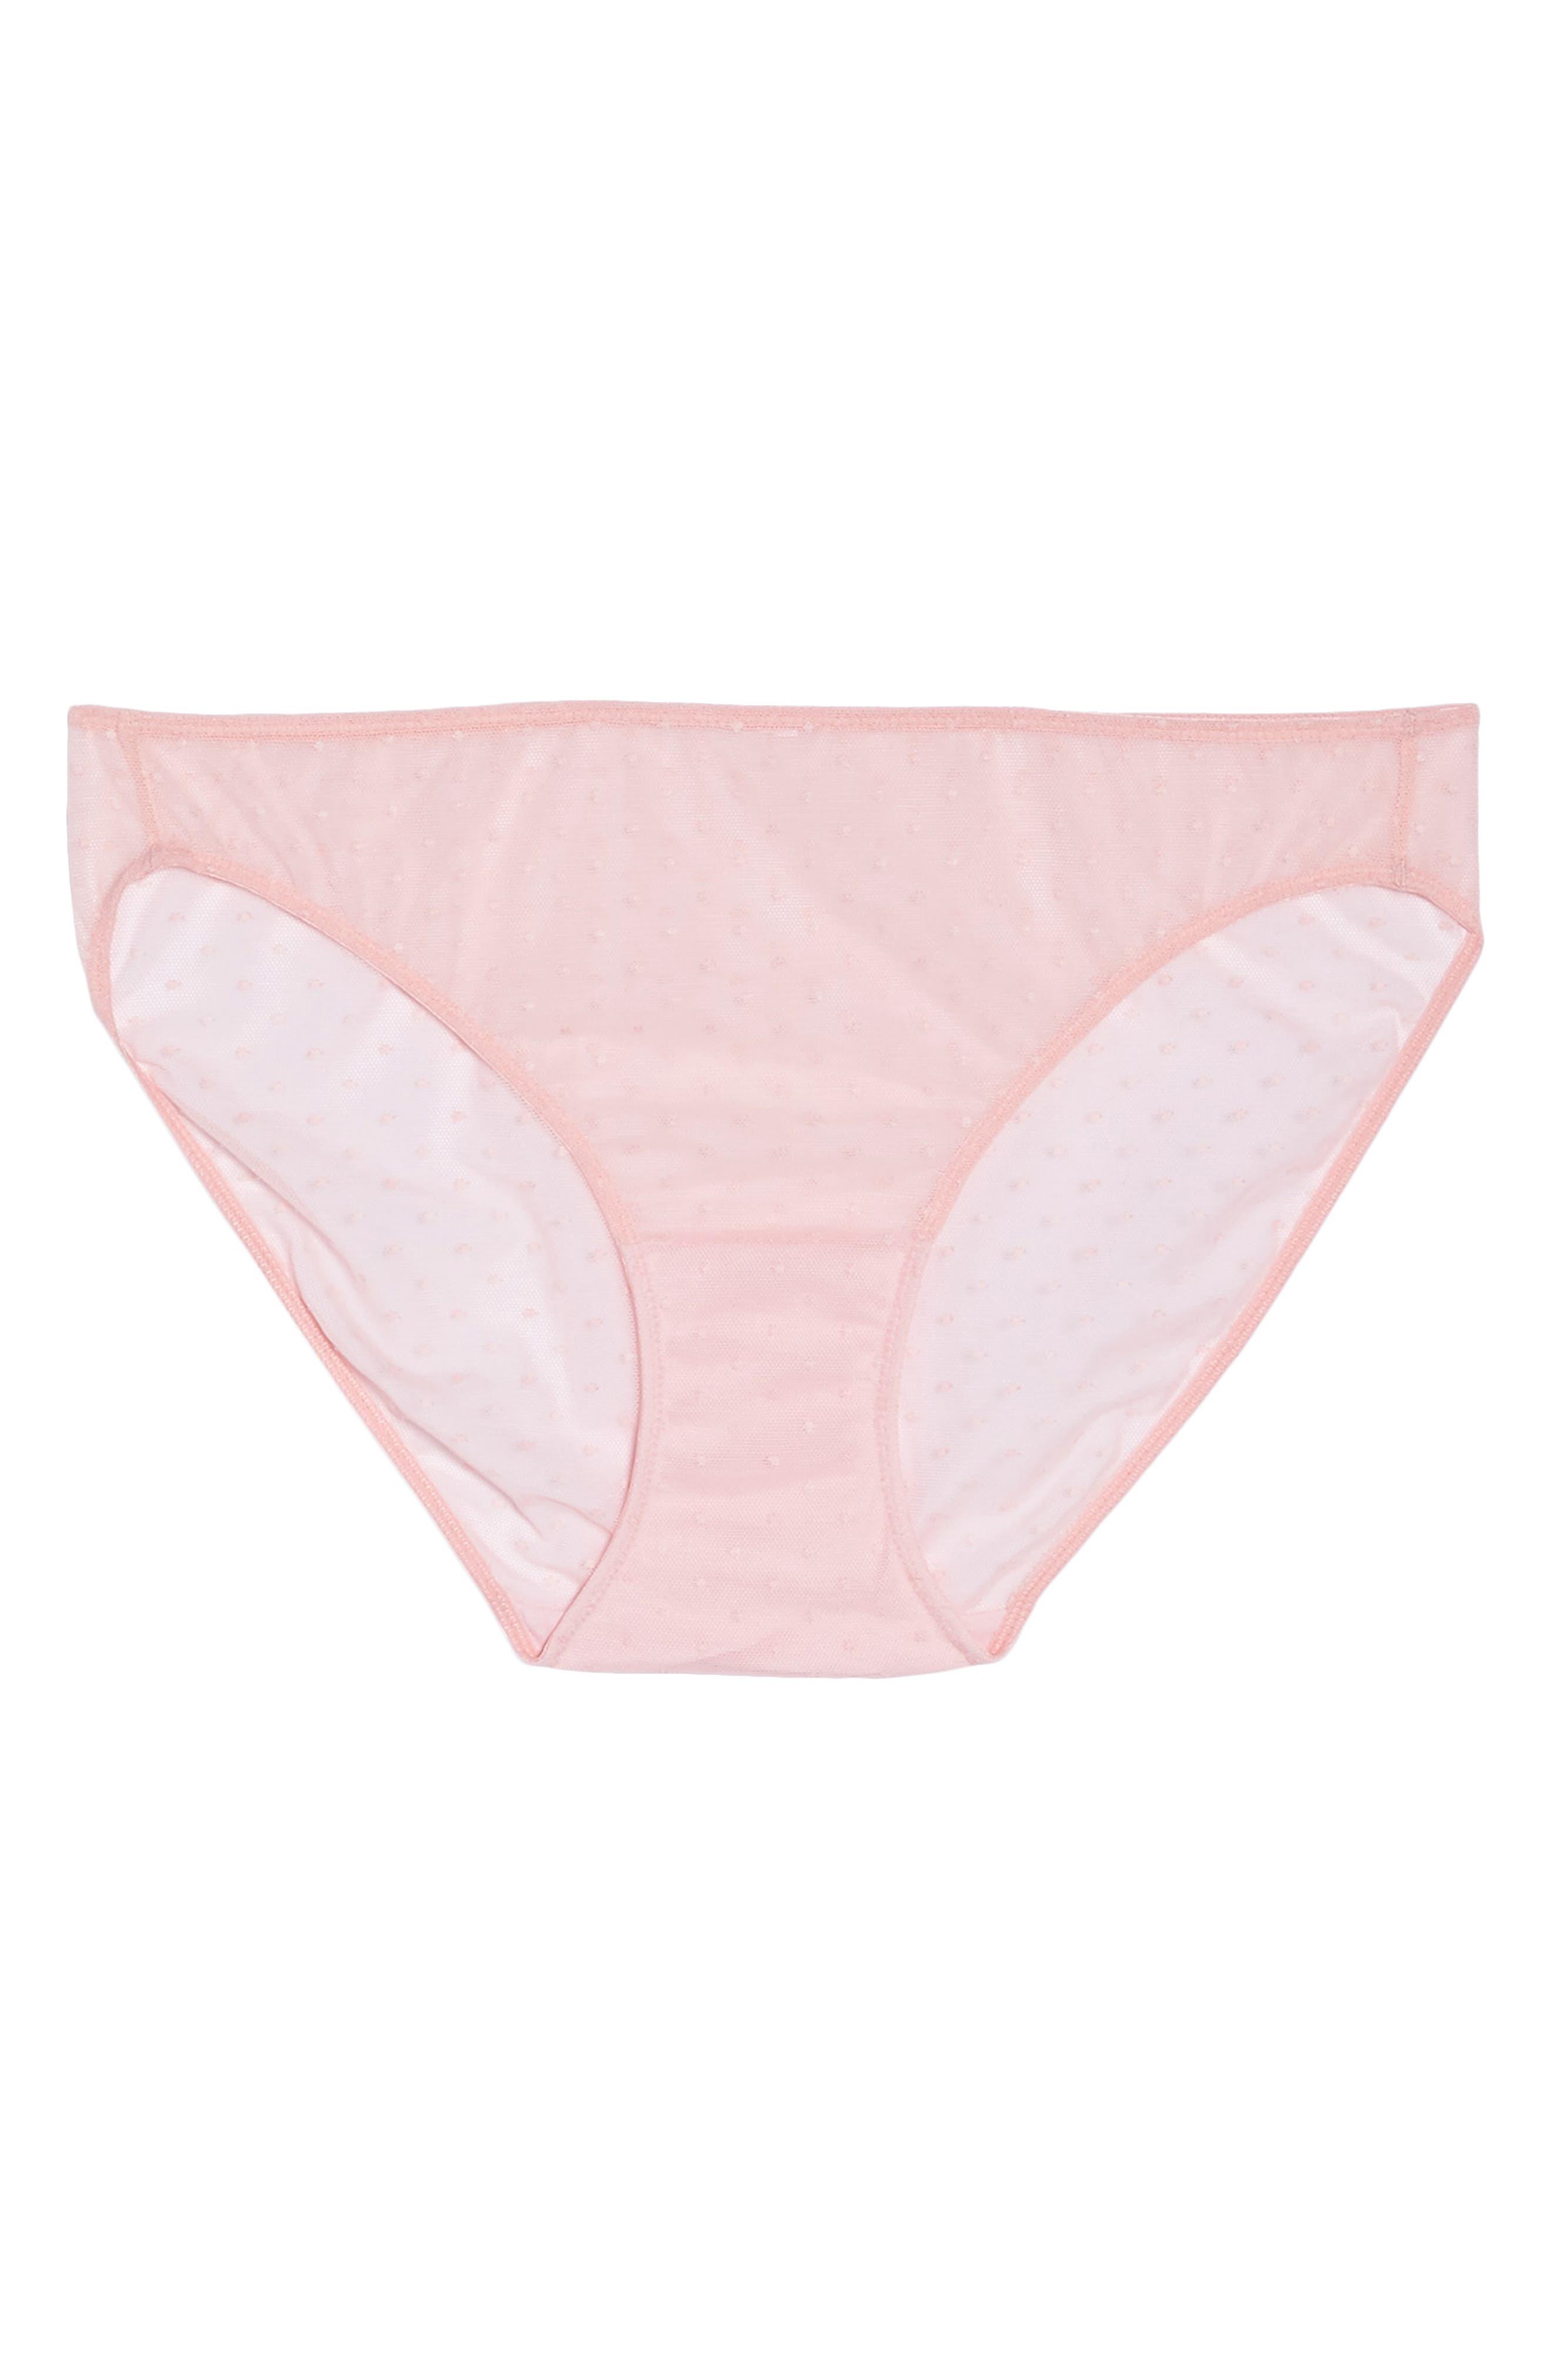 Swiss Dot Bikini,                             Alternate thumbnail 4, color,                             Candy Pink